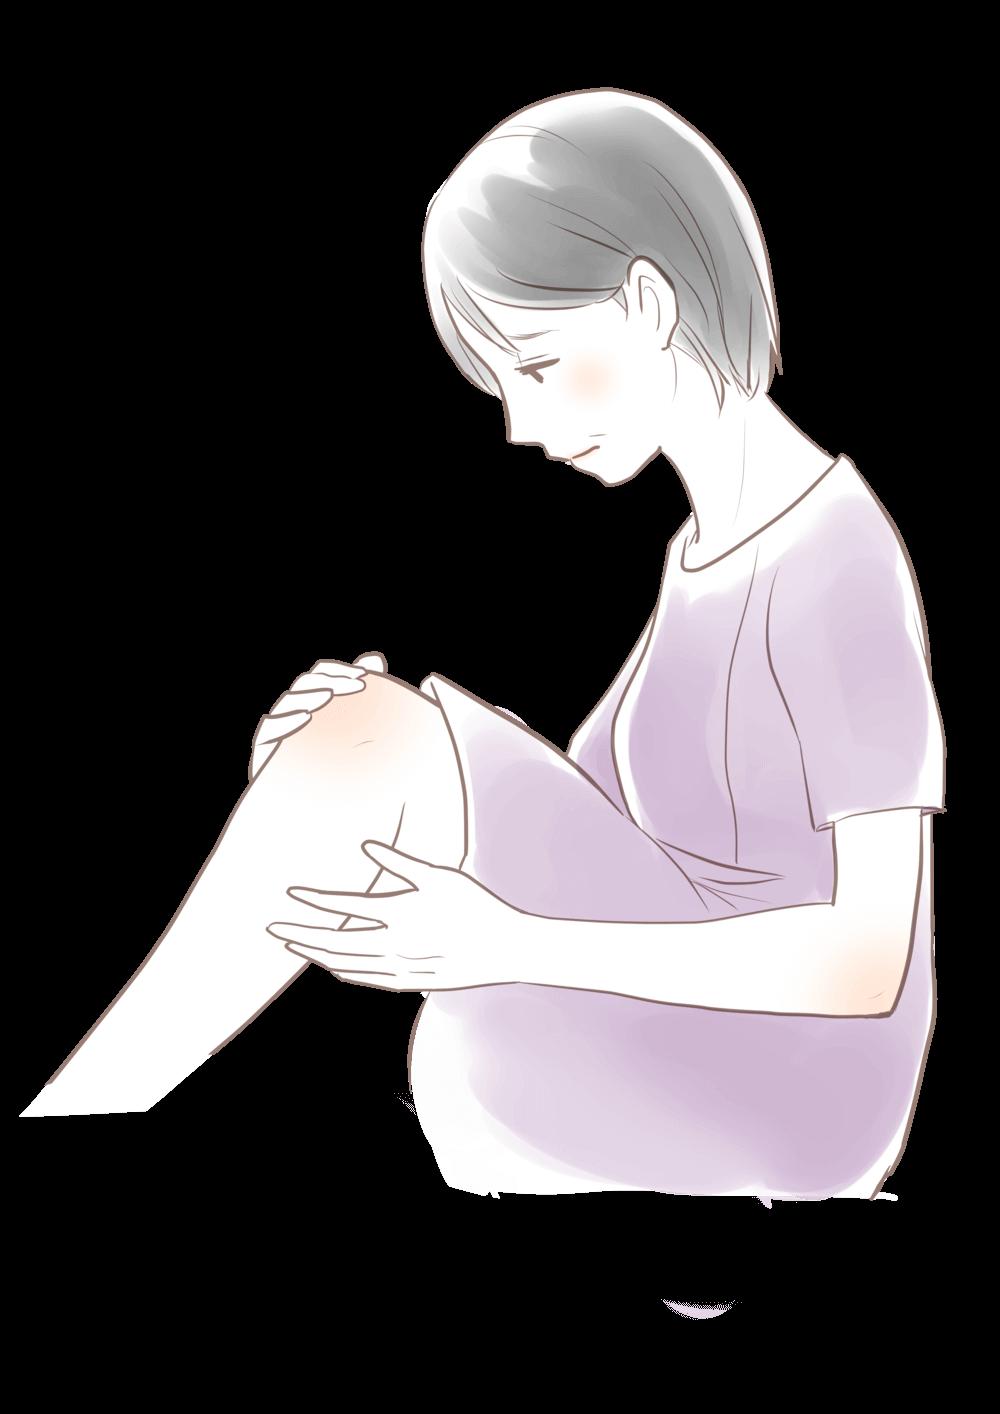 ligament